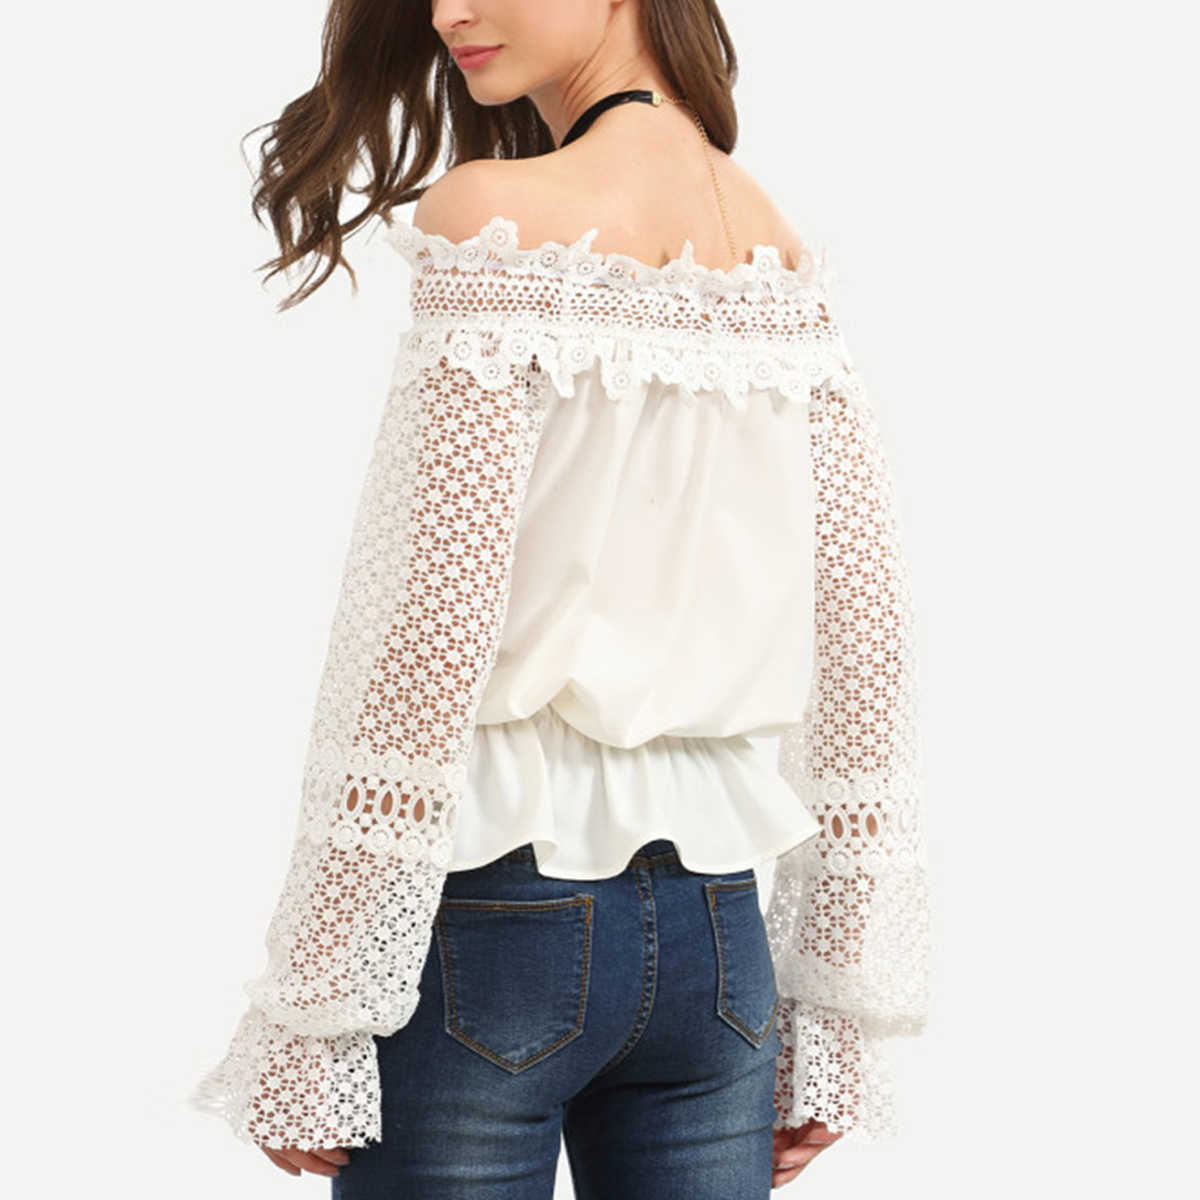 014f6aa7d36 ... Women Off Shoulder Blouse Shirt Elegant Lace Long Sleeve Elastic Loose  Crop Top Casual Female Slash ...